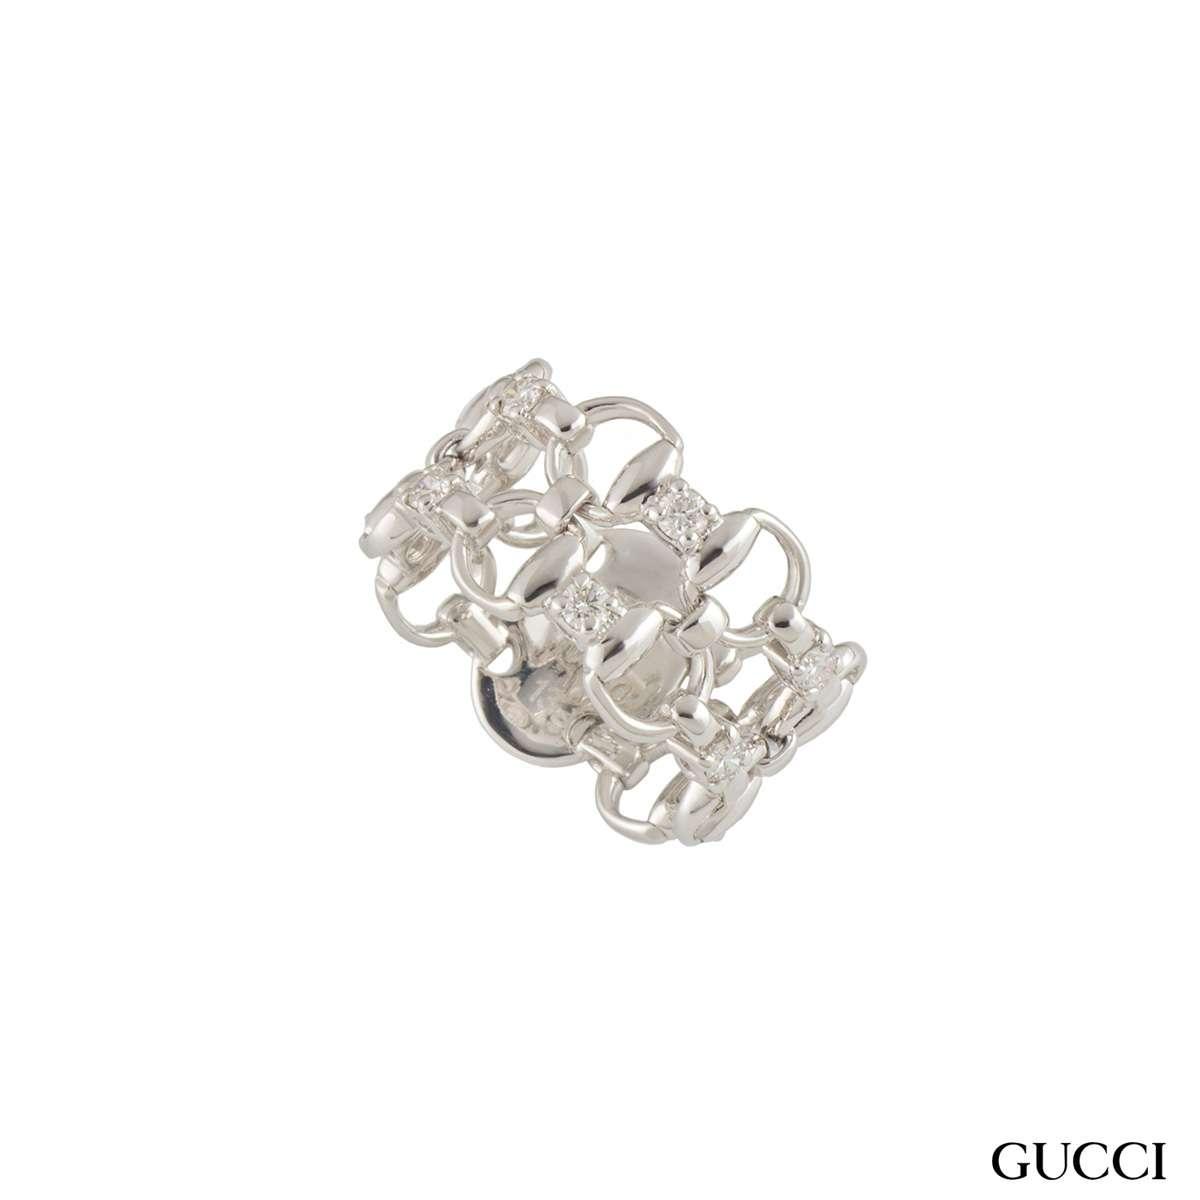 Gucci White Gold Horsebit Ring